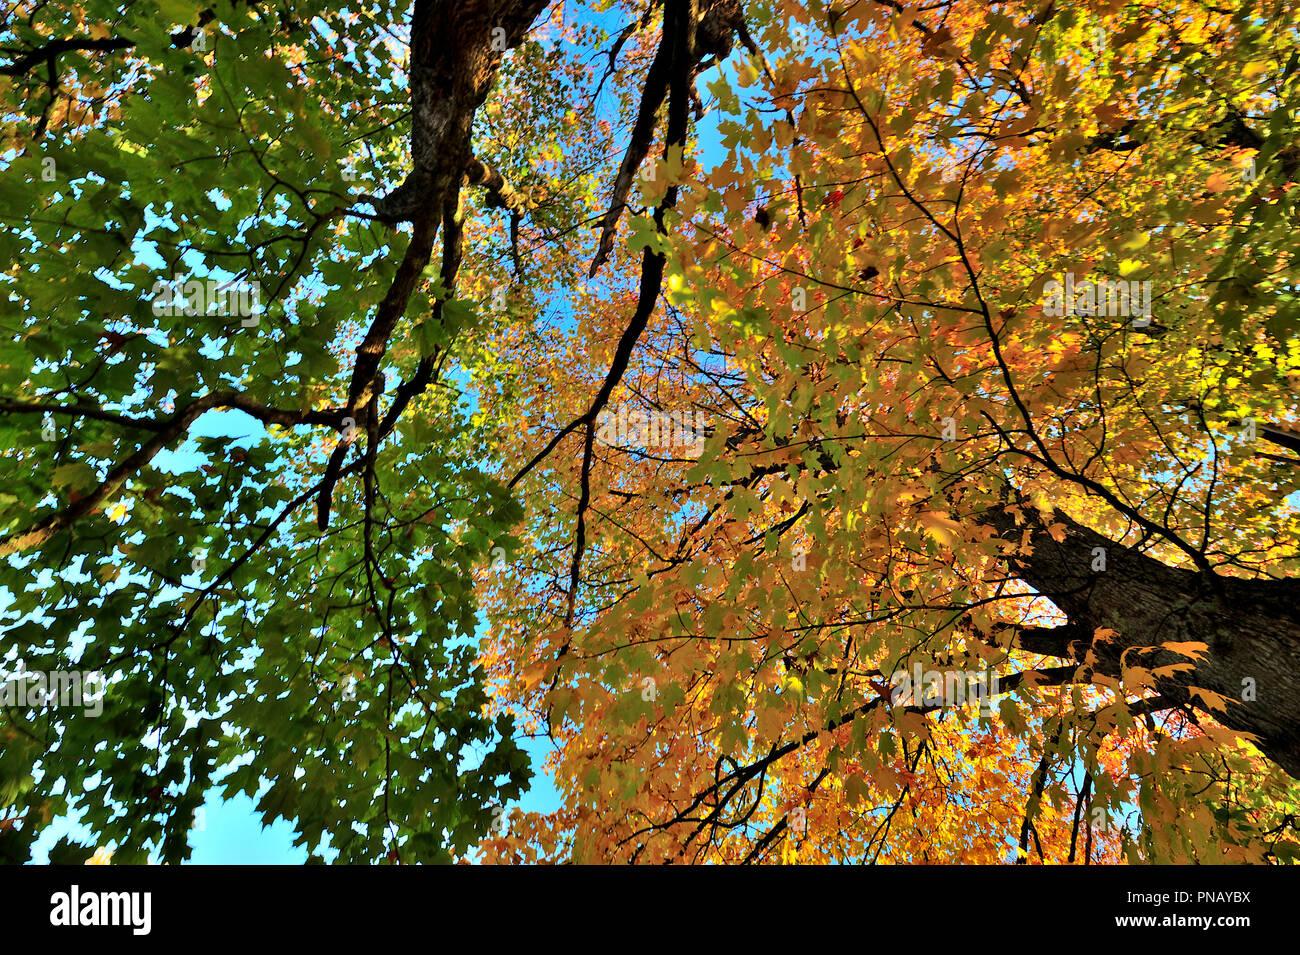 Canada Maple Autumn Landscape Stock Photos Amp Canada Maple